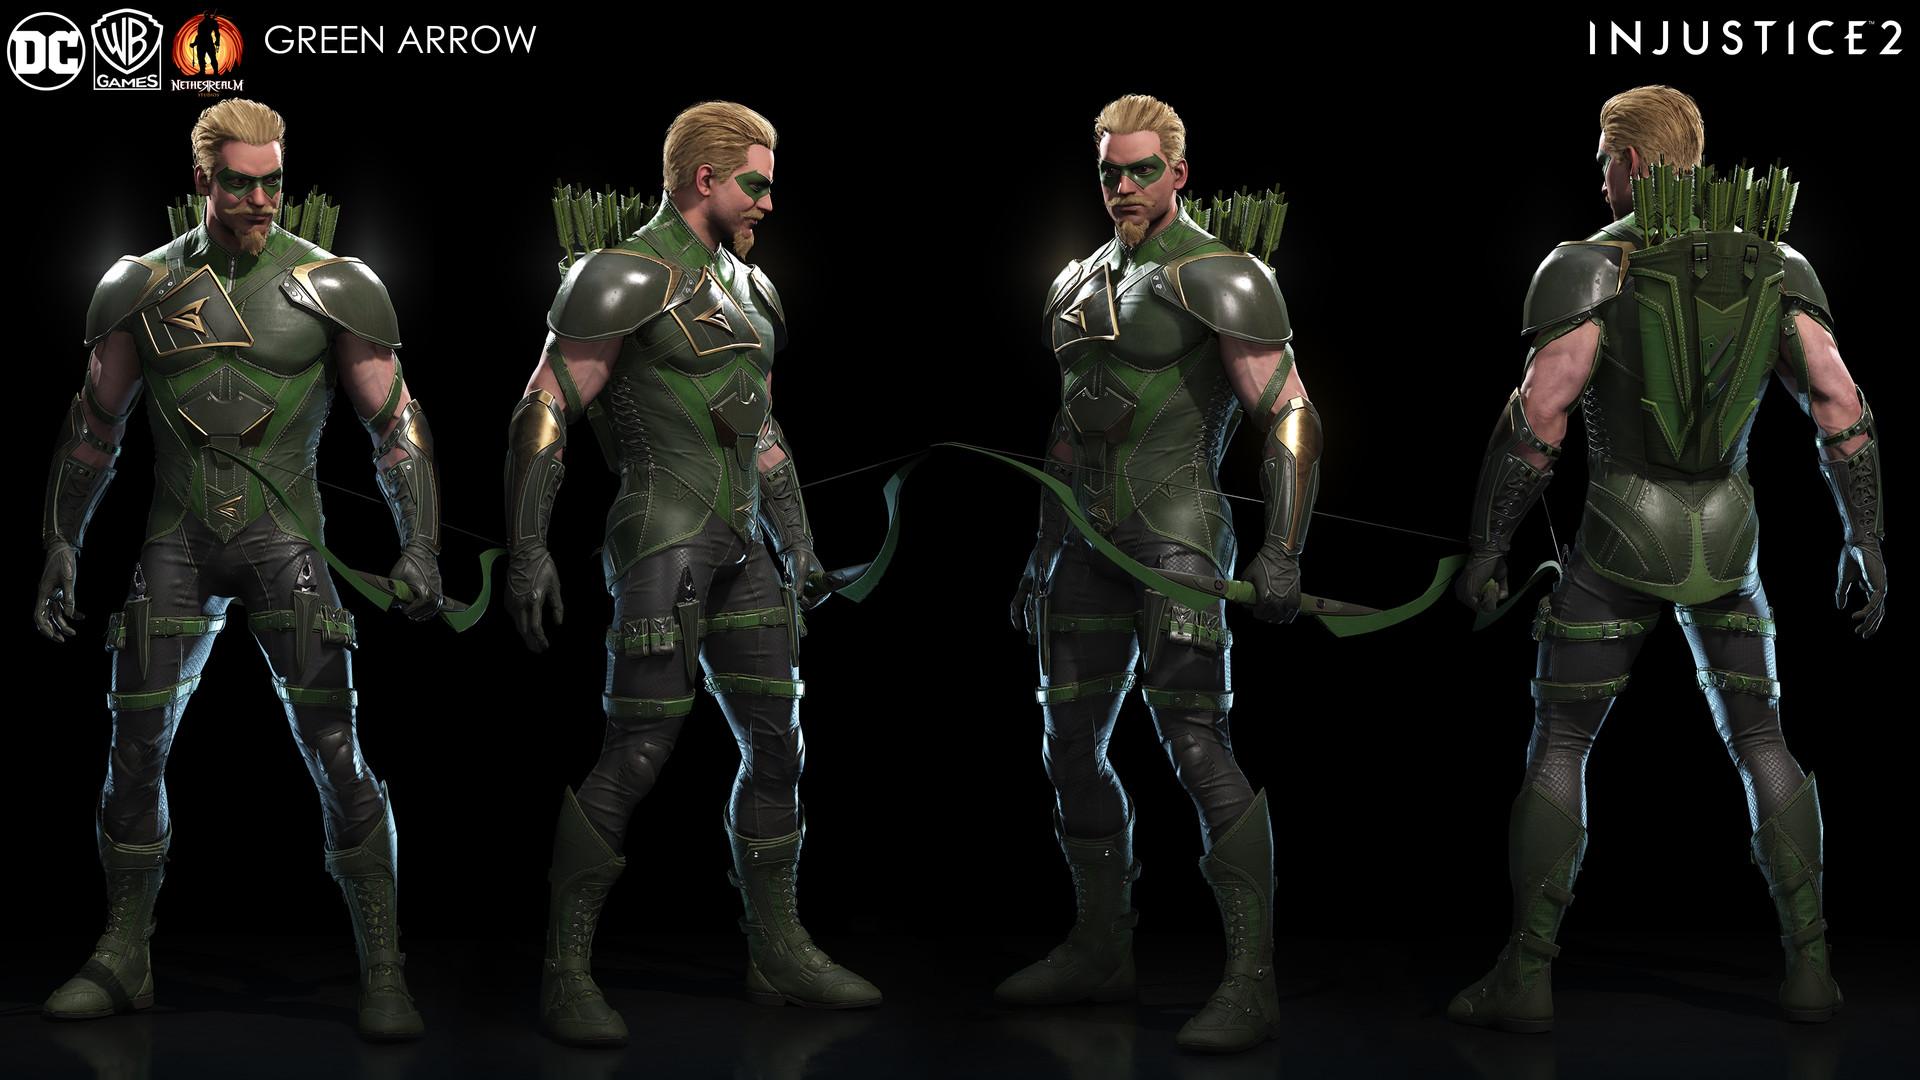 Injustice 2 Green Arrow Game Asset